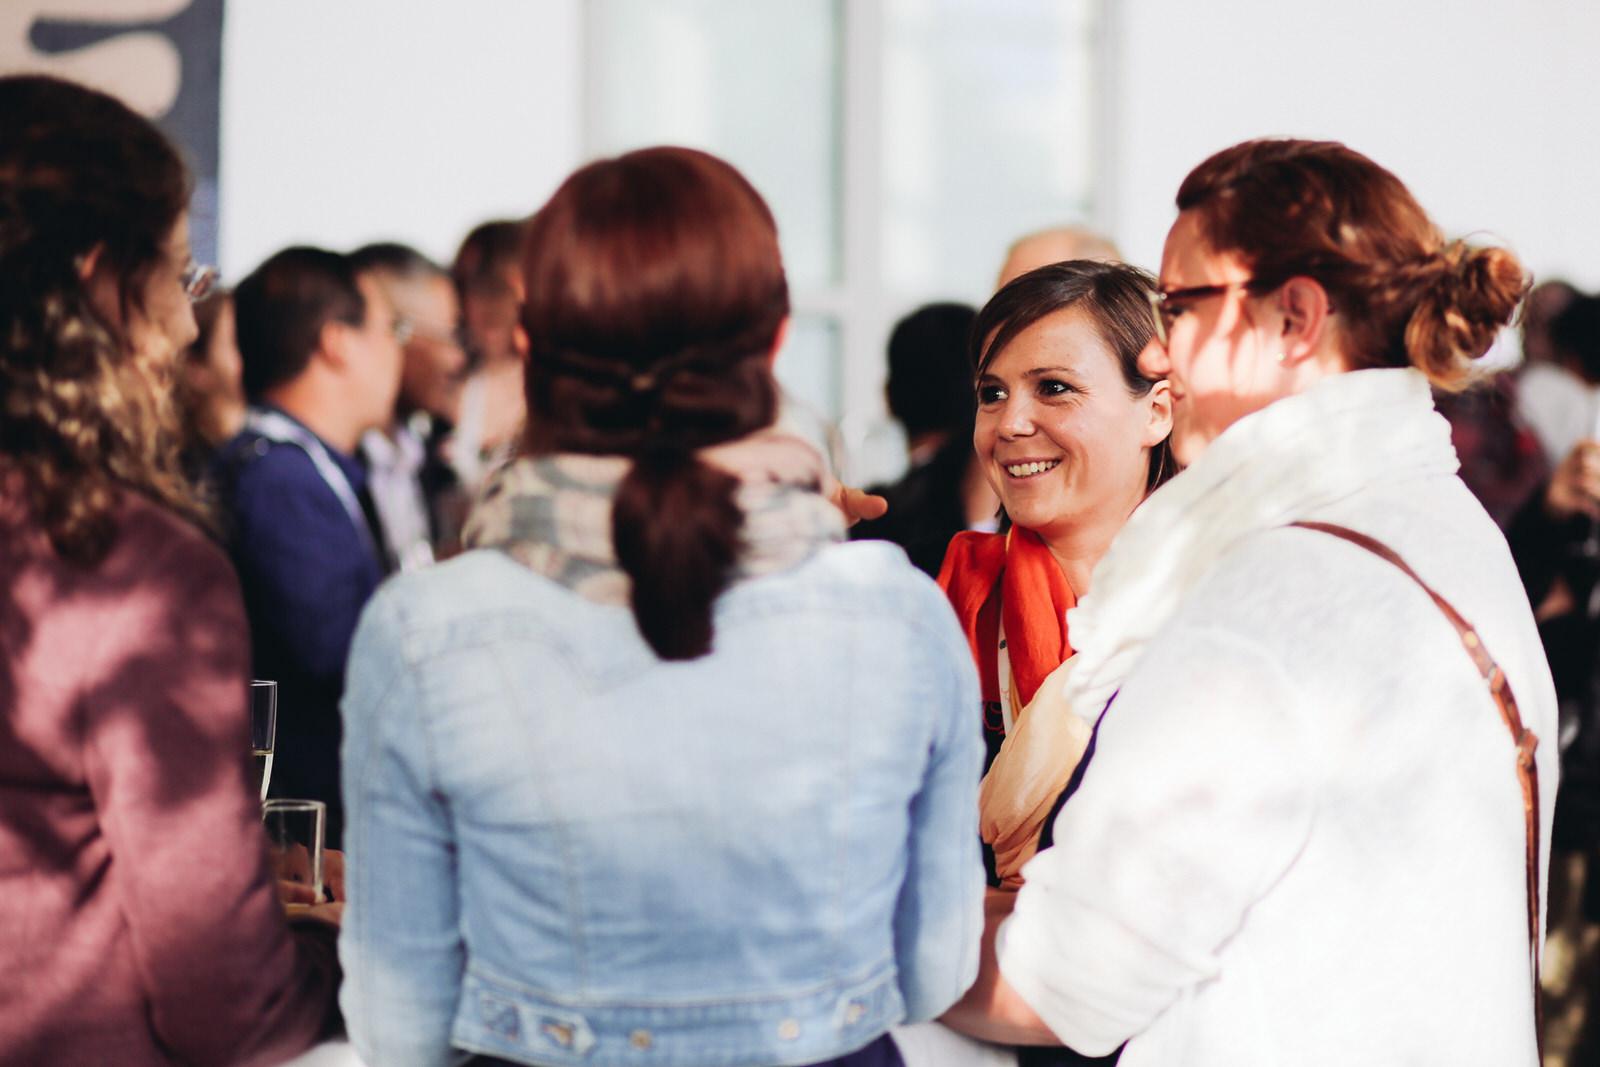 Corporate-conference-photographer-dublin-009.jpg